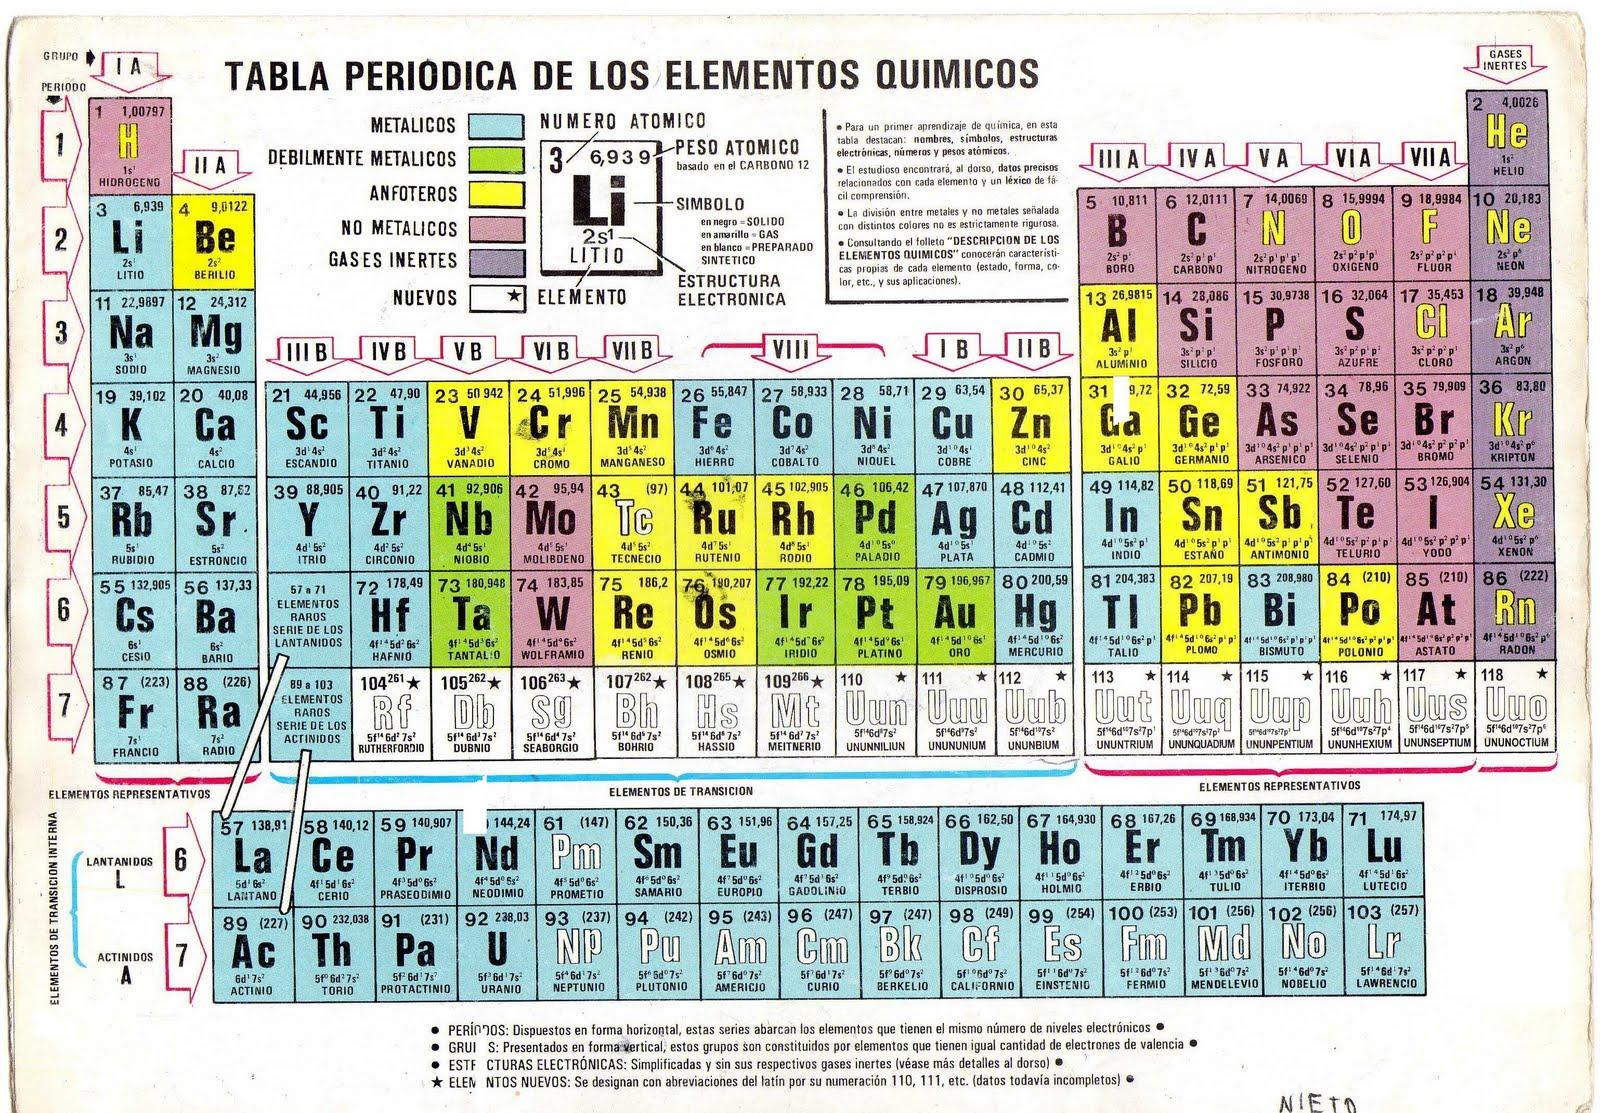 Clasificacin de la tabla peridica moderna de los elementos qumicos aqu podemos observar los grupos y periodos de la tabla peridica moderna urtaz Images